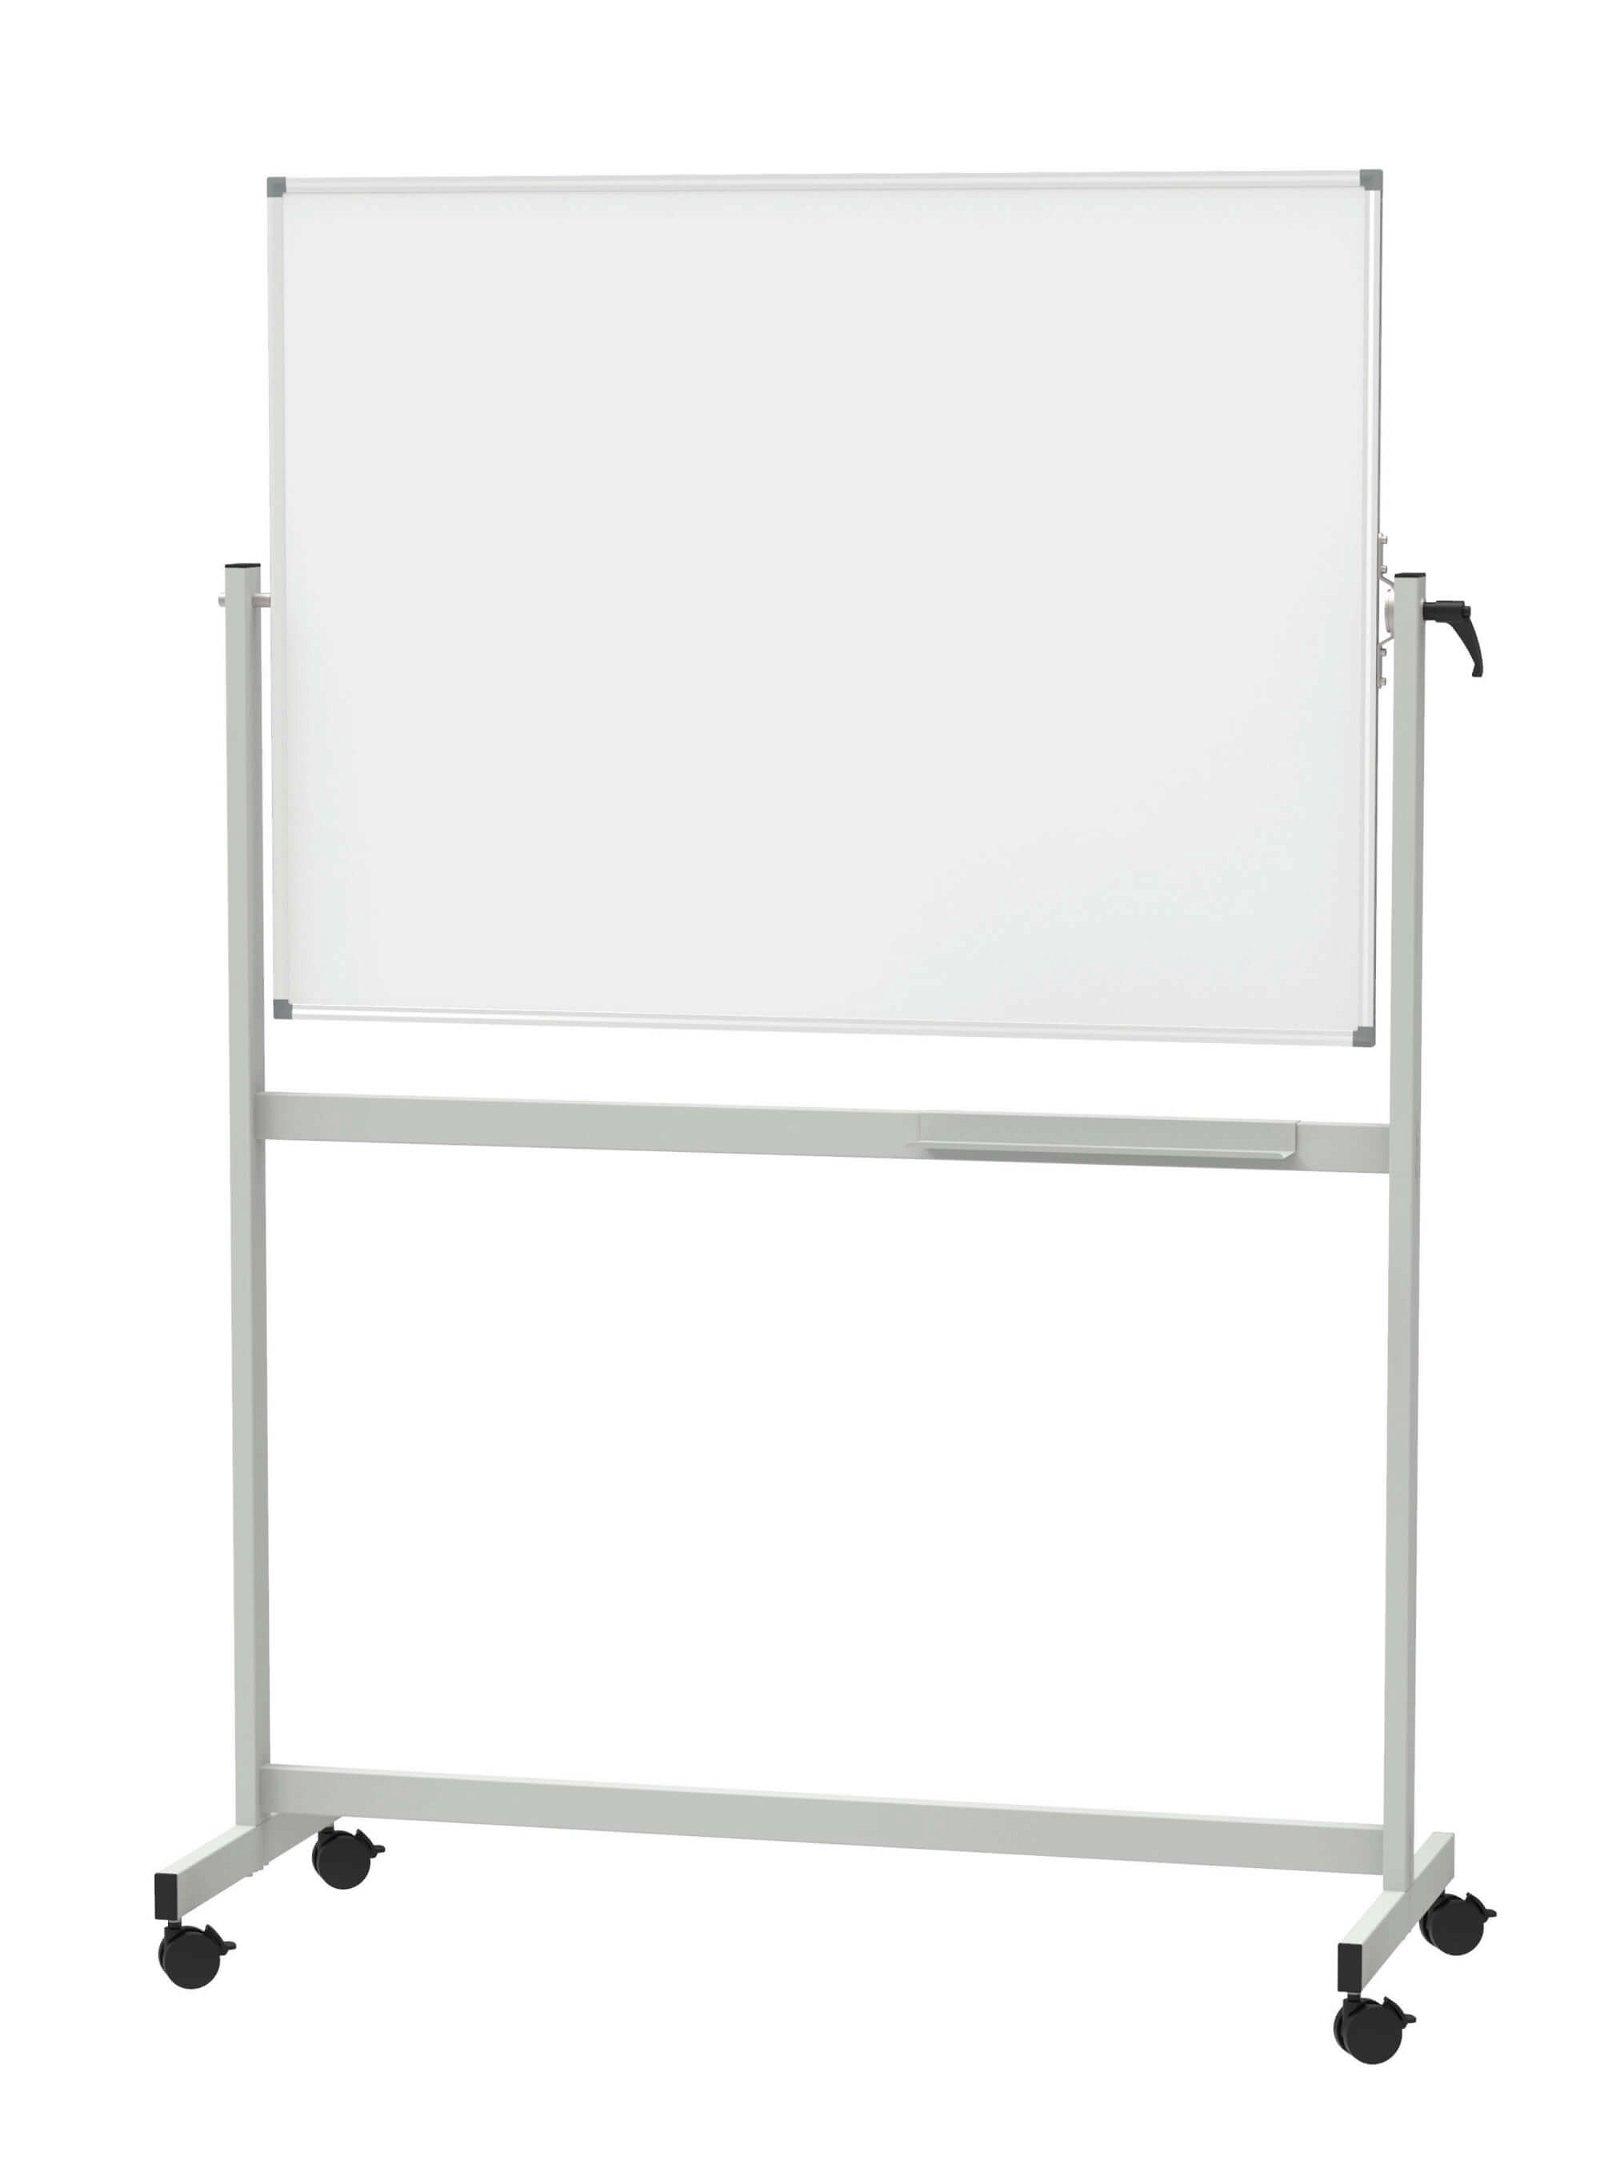 Mobiles Whiteb. MAULstandard, drehbar, Emaille, 90x120 cm, grau